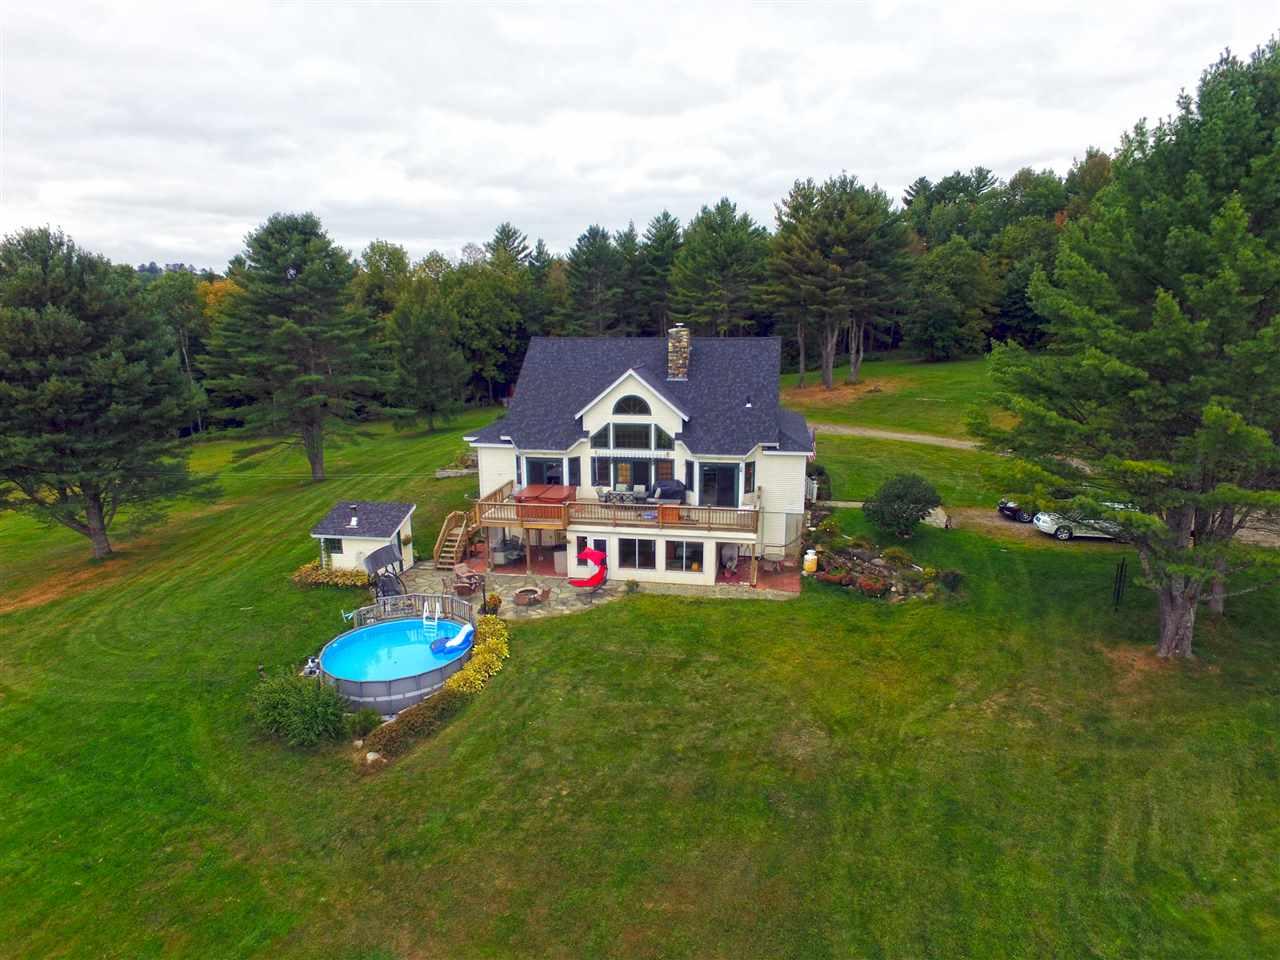 Danville VTHorse Farm | Property  on Private Man-Made Pond